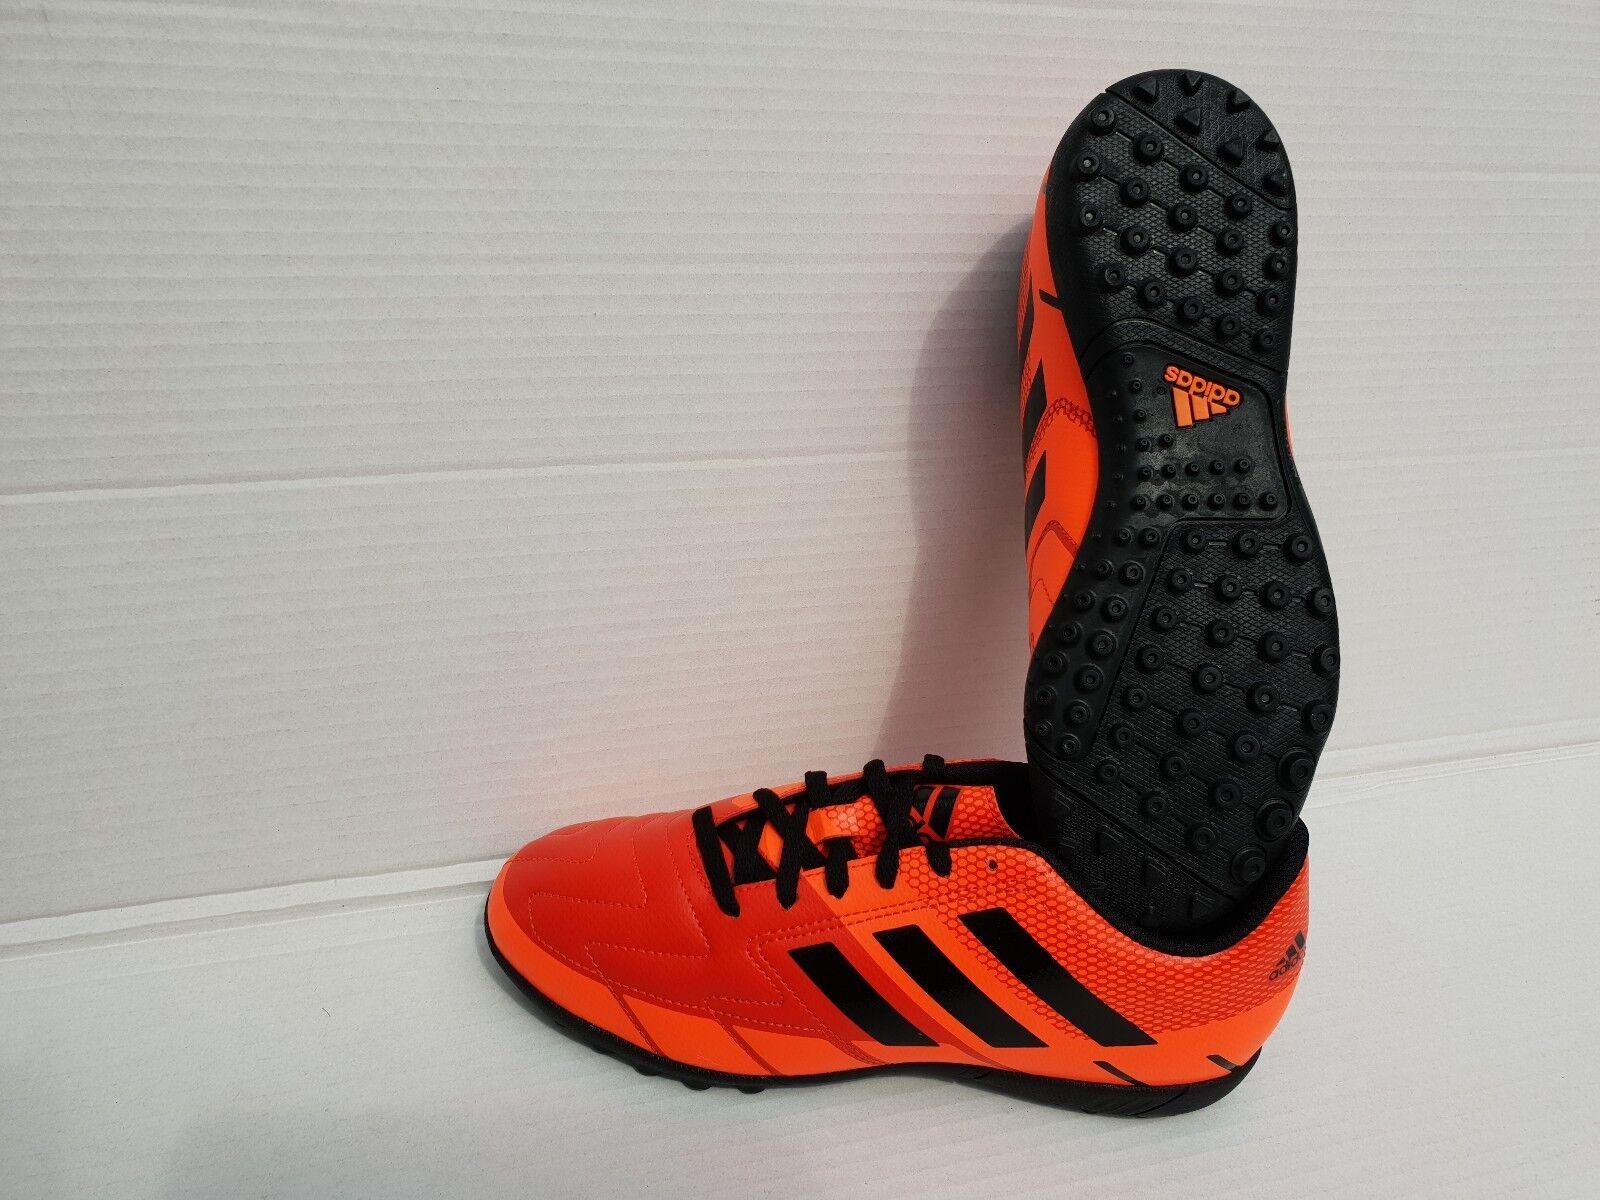 Adidas Kinder Fuballschuhe Kunstrasen Rasen Asche 34 35 36 37 38 Multi Nocken